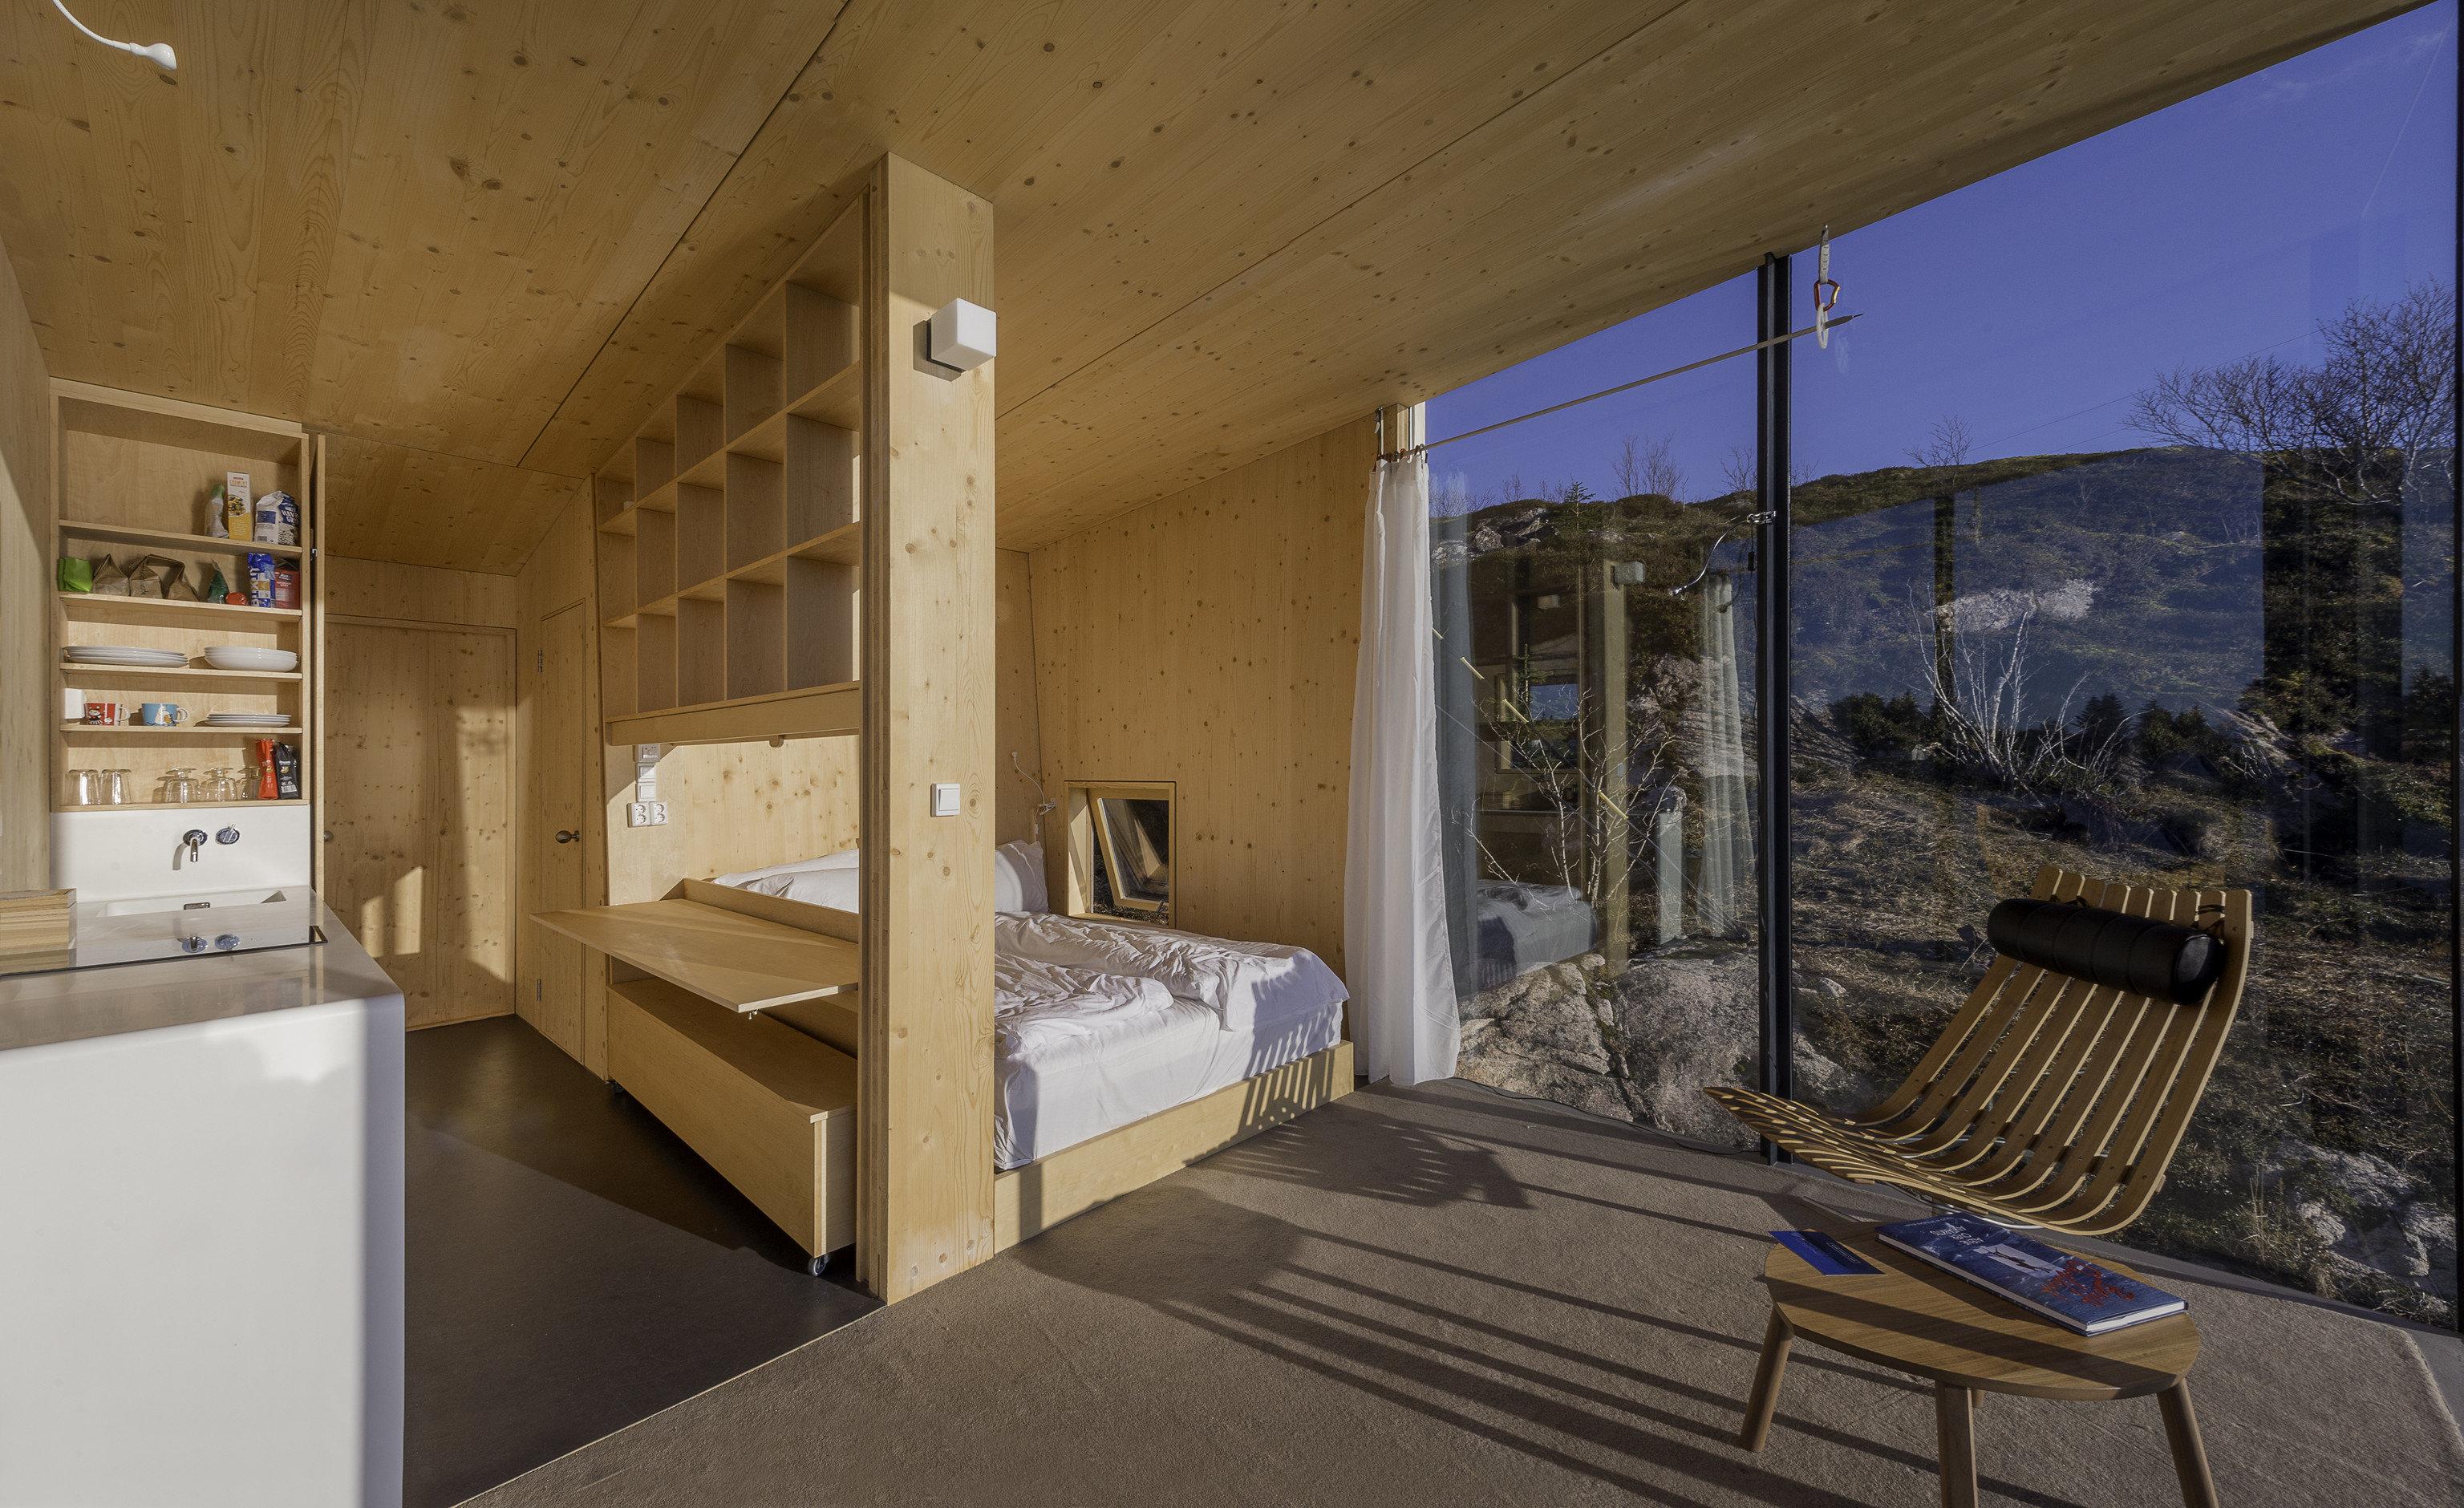 Norway Oslo Trip Ideas indoor ceiling Architecture interior design house real estate home estate window interior designer daylighting